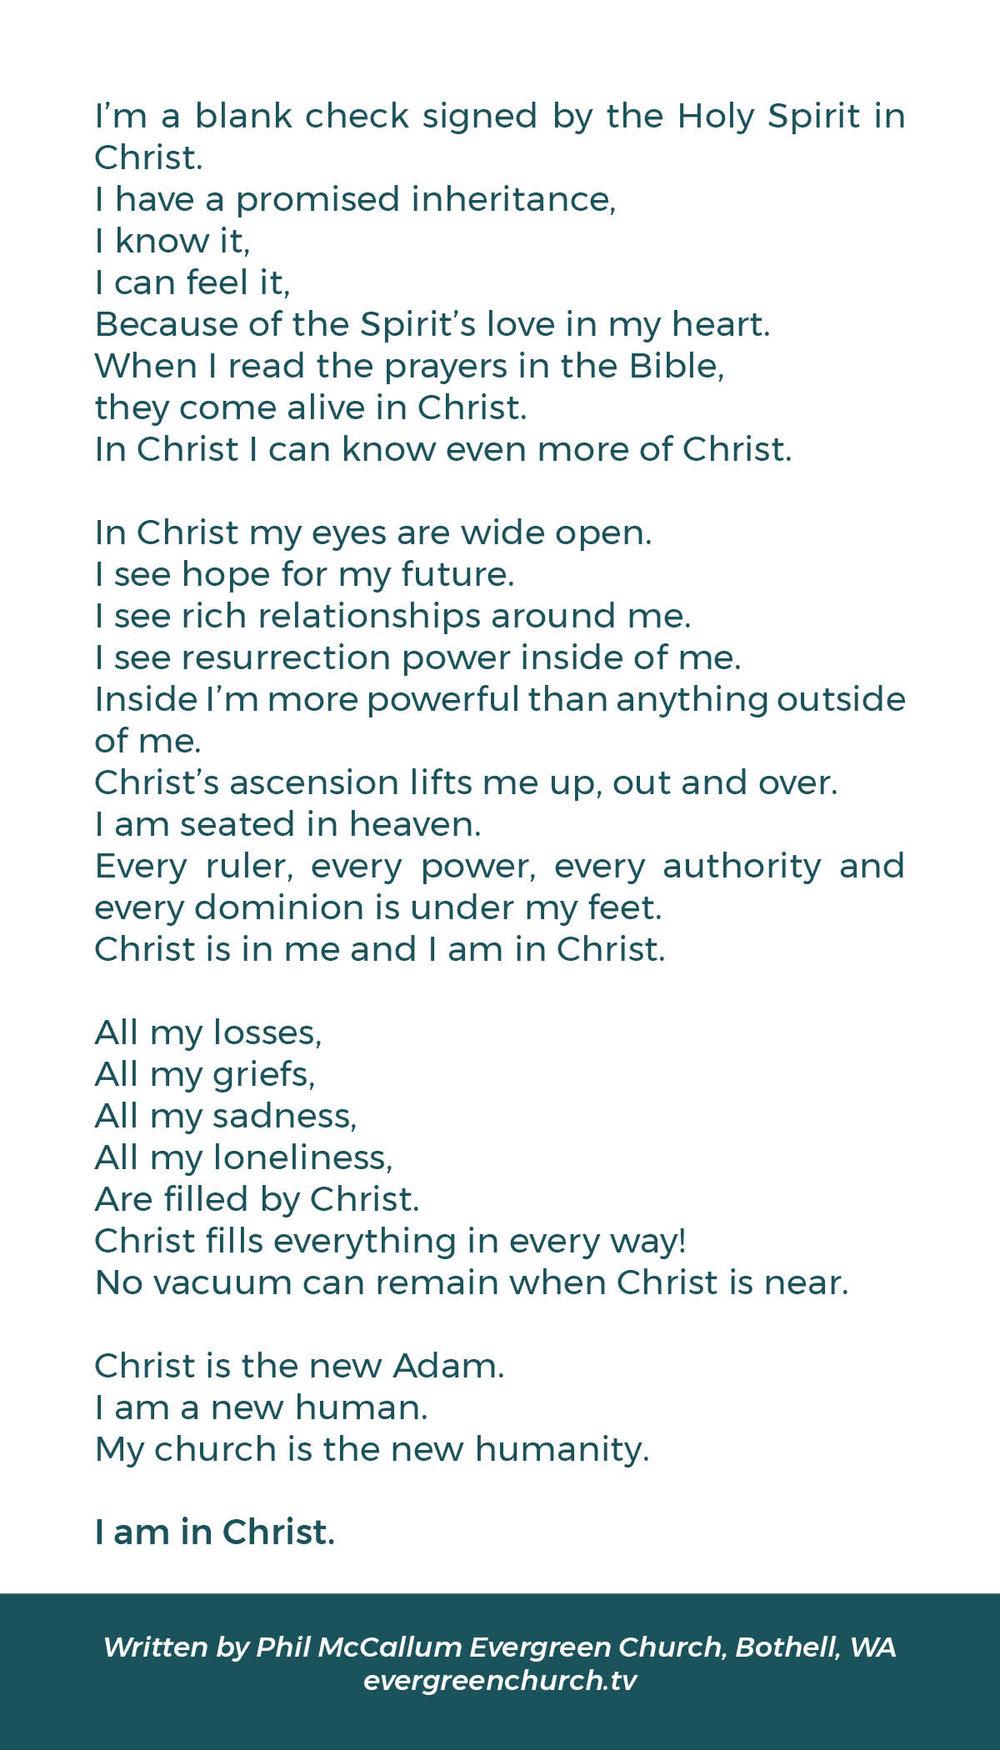 I Am In Christ Card2.jpg